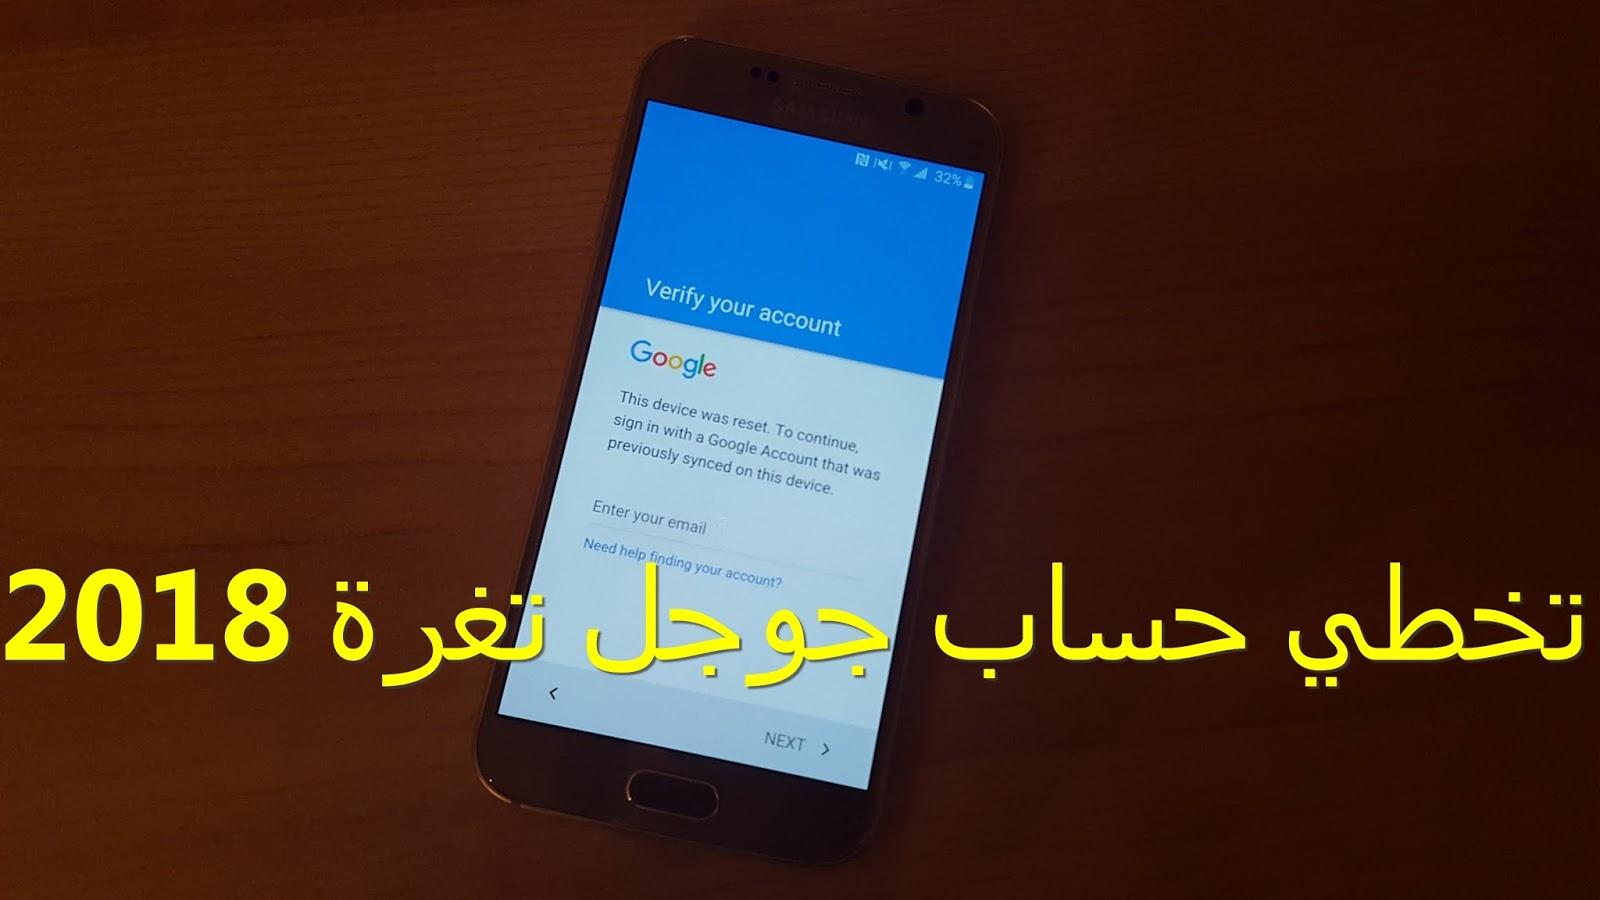 حل مشكلة حساب جوجل اكاونت بعد الفورمات ثغرة 2018 A3 A5 A7 6 A8